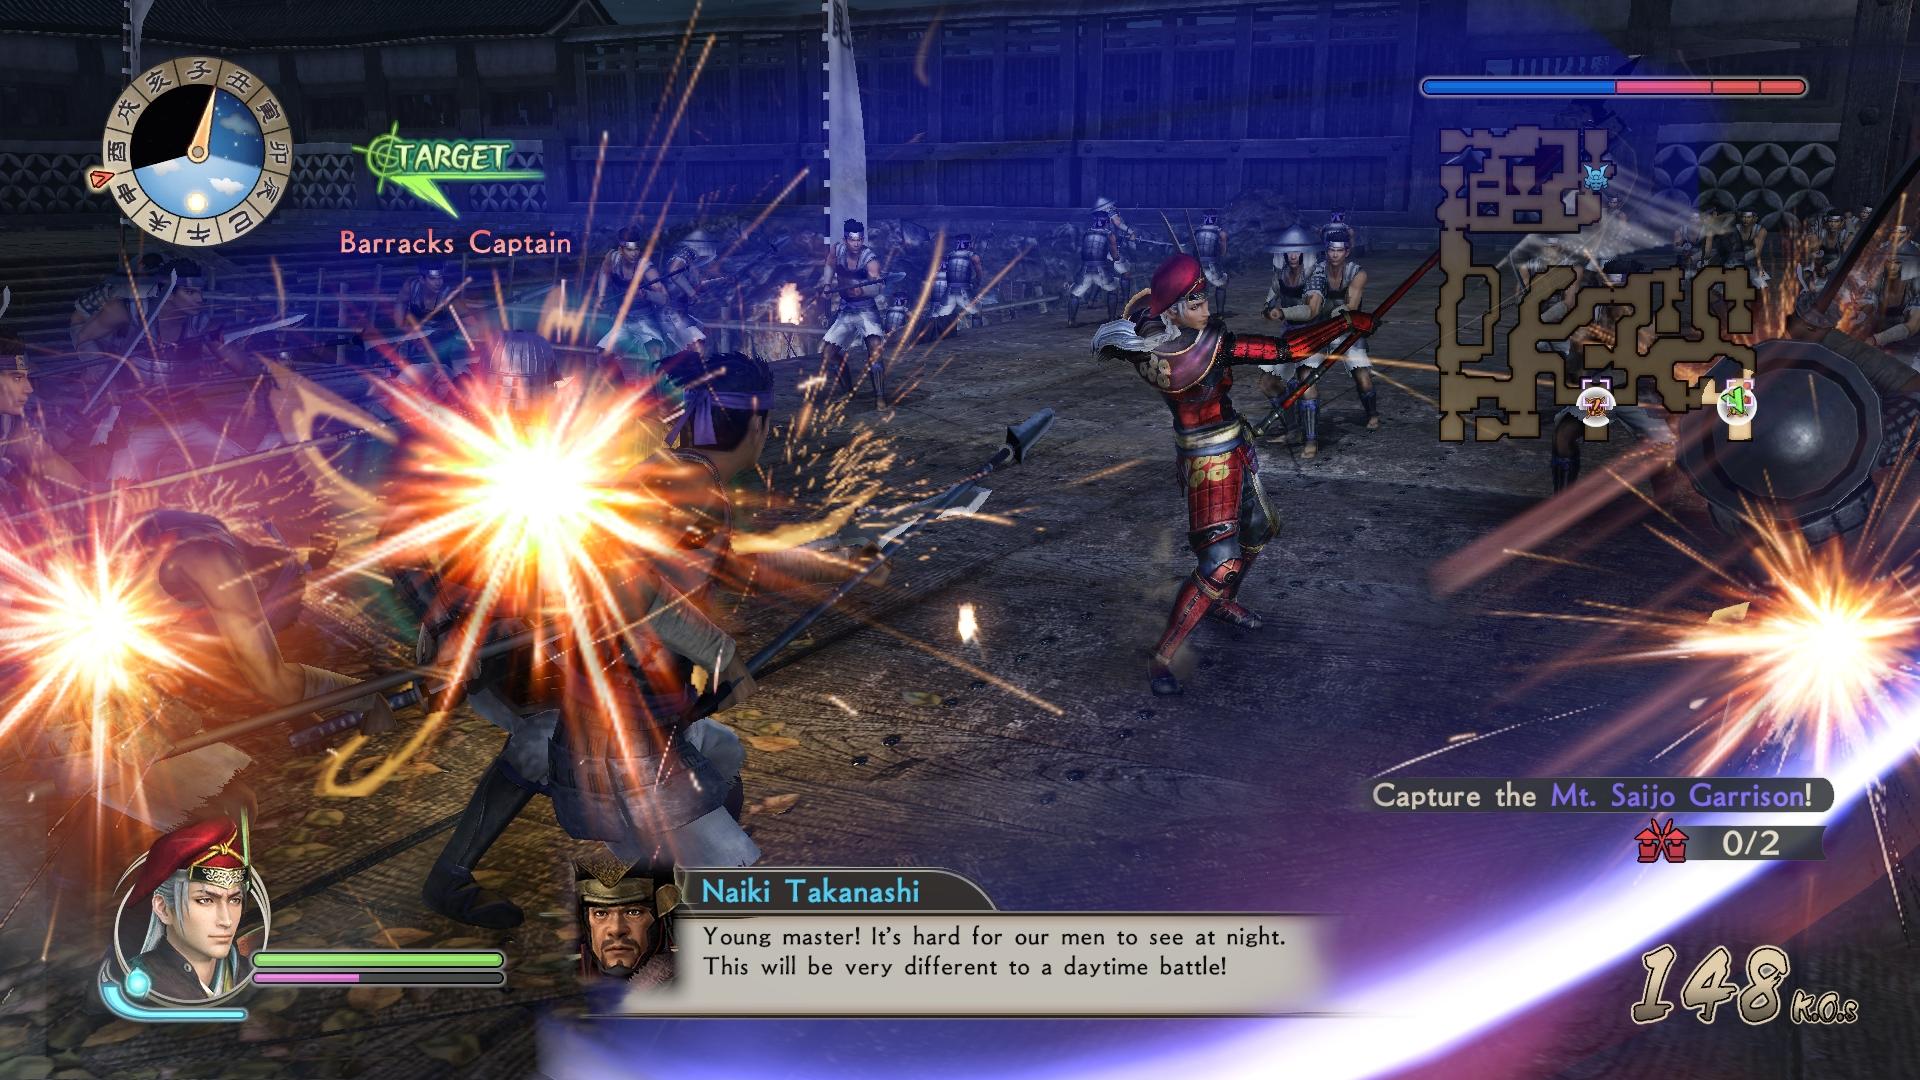 Detaily bojového systému v Samurai Warriors: Spirit of Sanada 142485